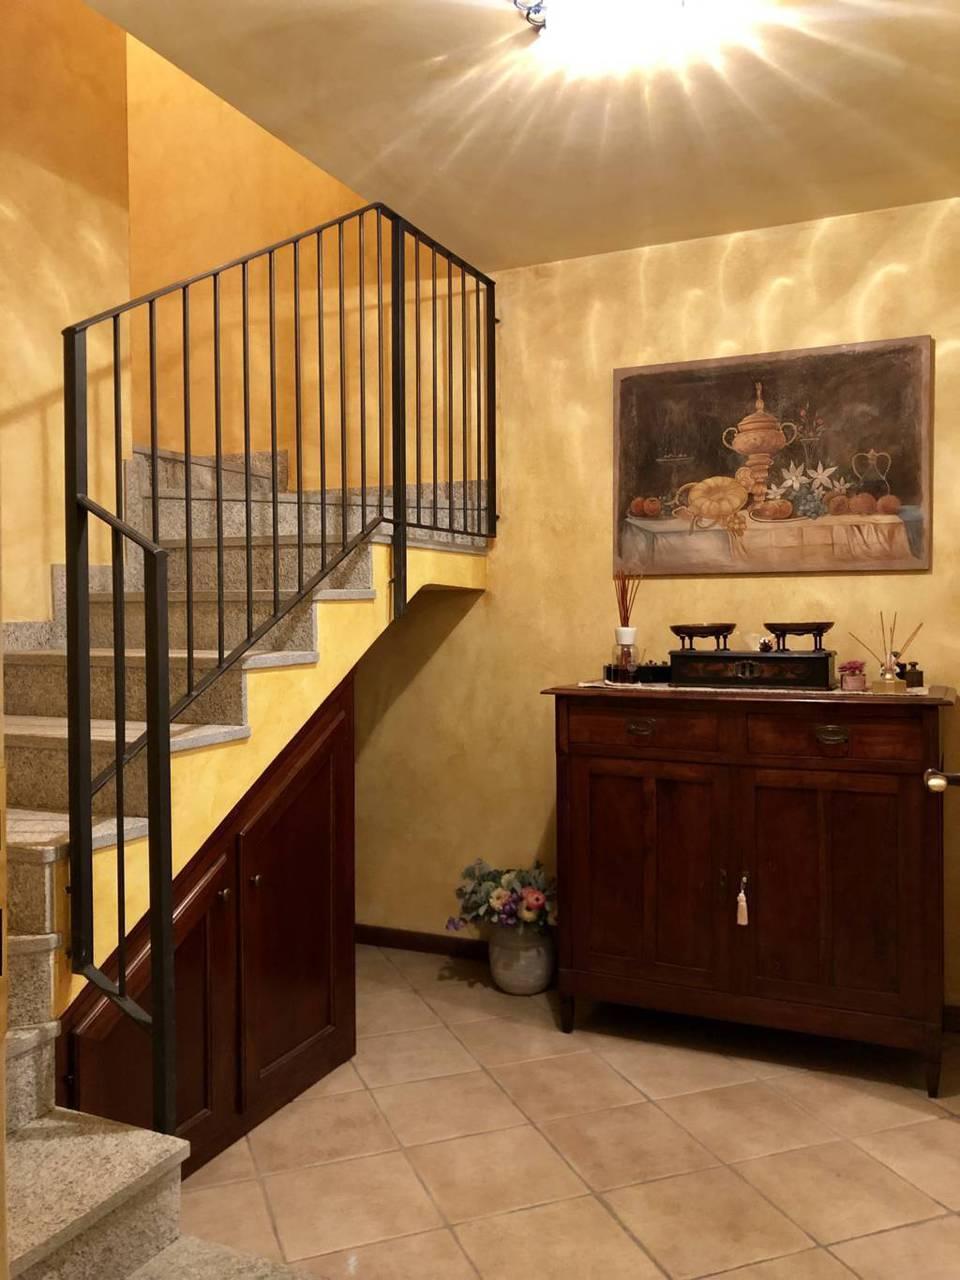 Villa-di-testa-Sulbiate-in-vendita-17